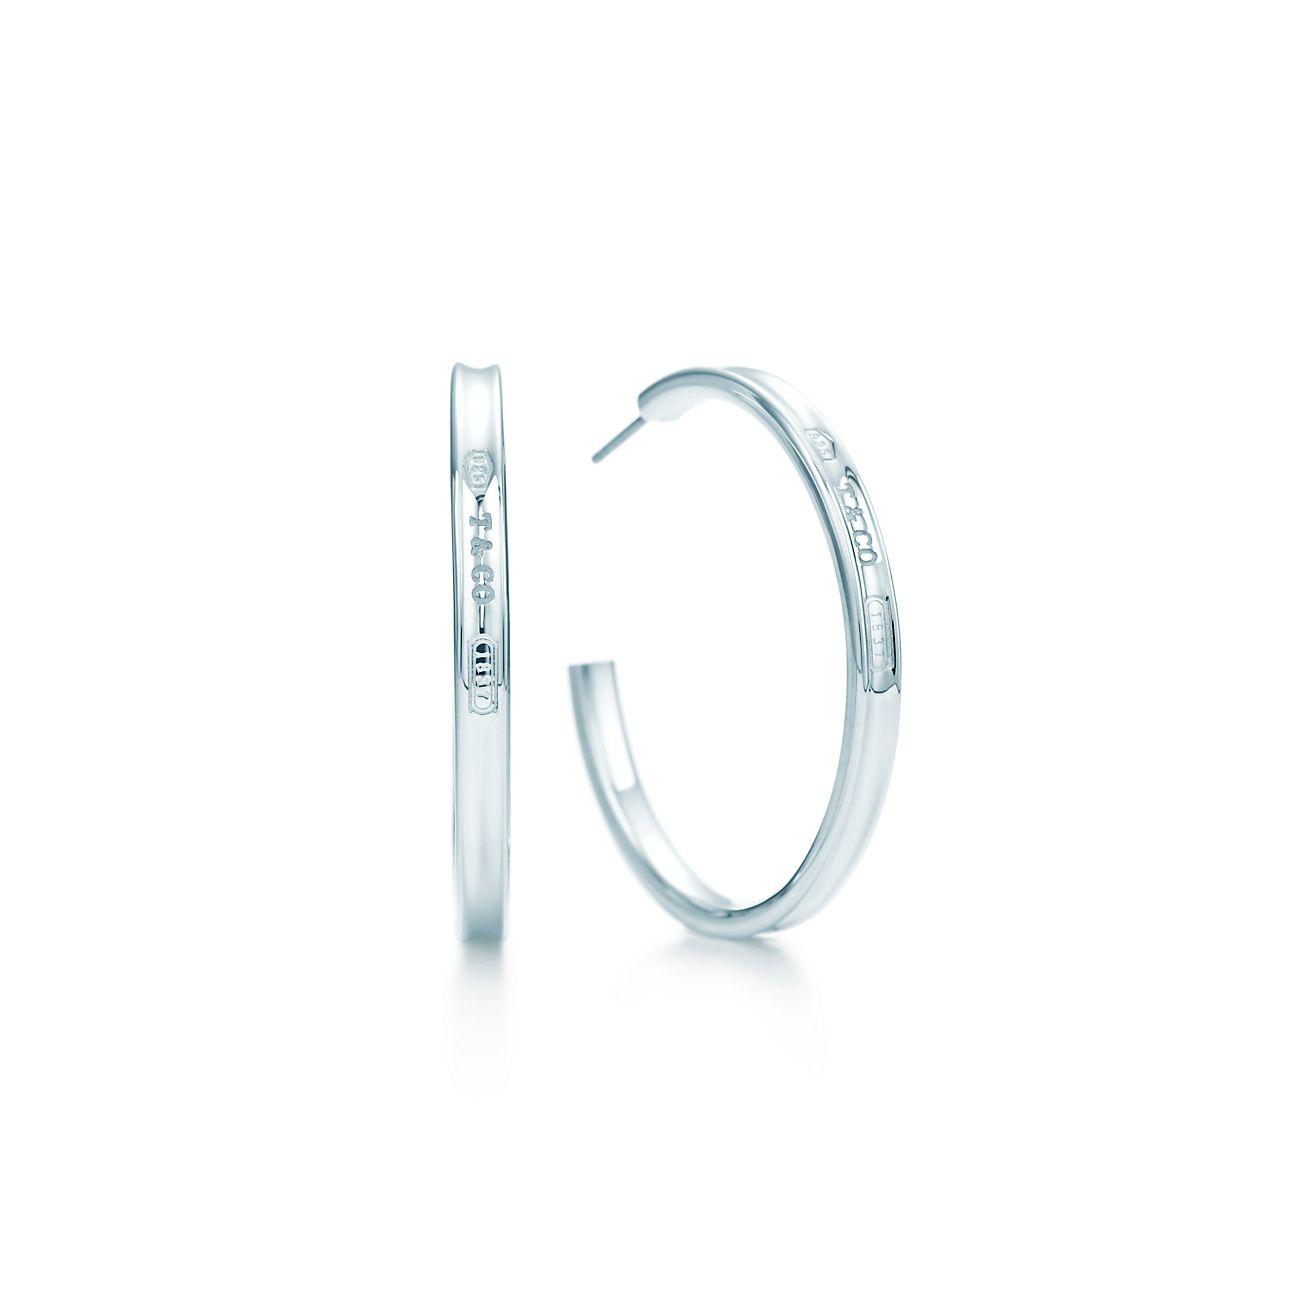 tiffany 1837 narrow hoop earrings in sterling silver